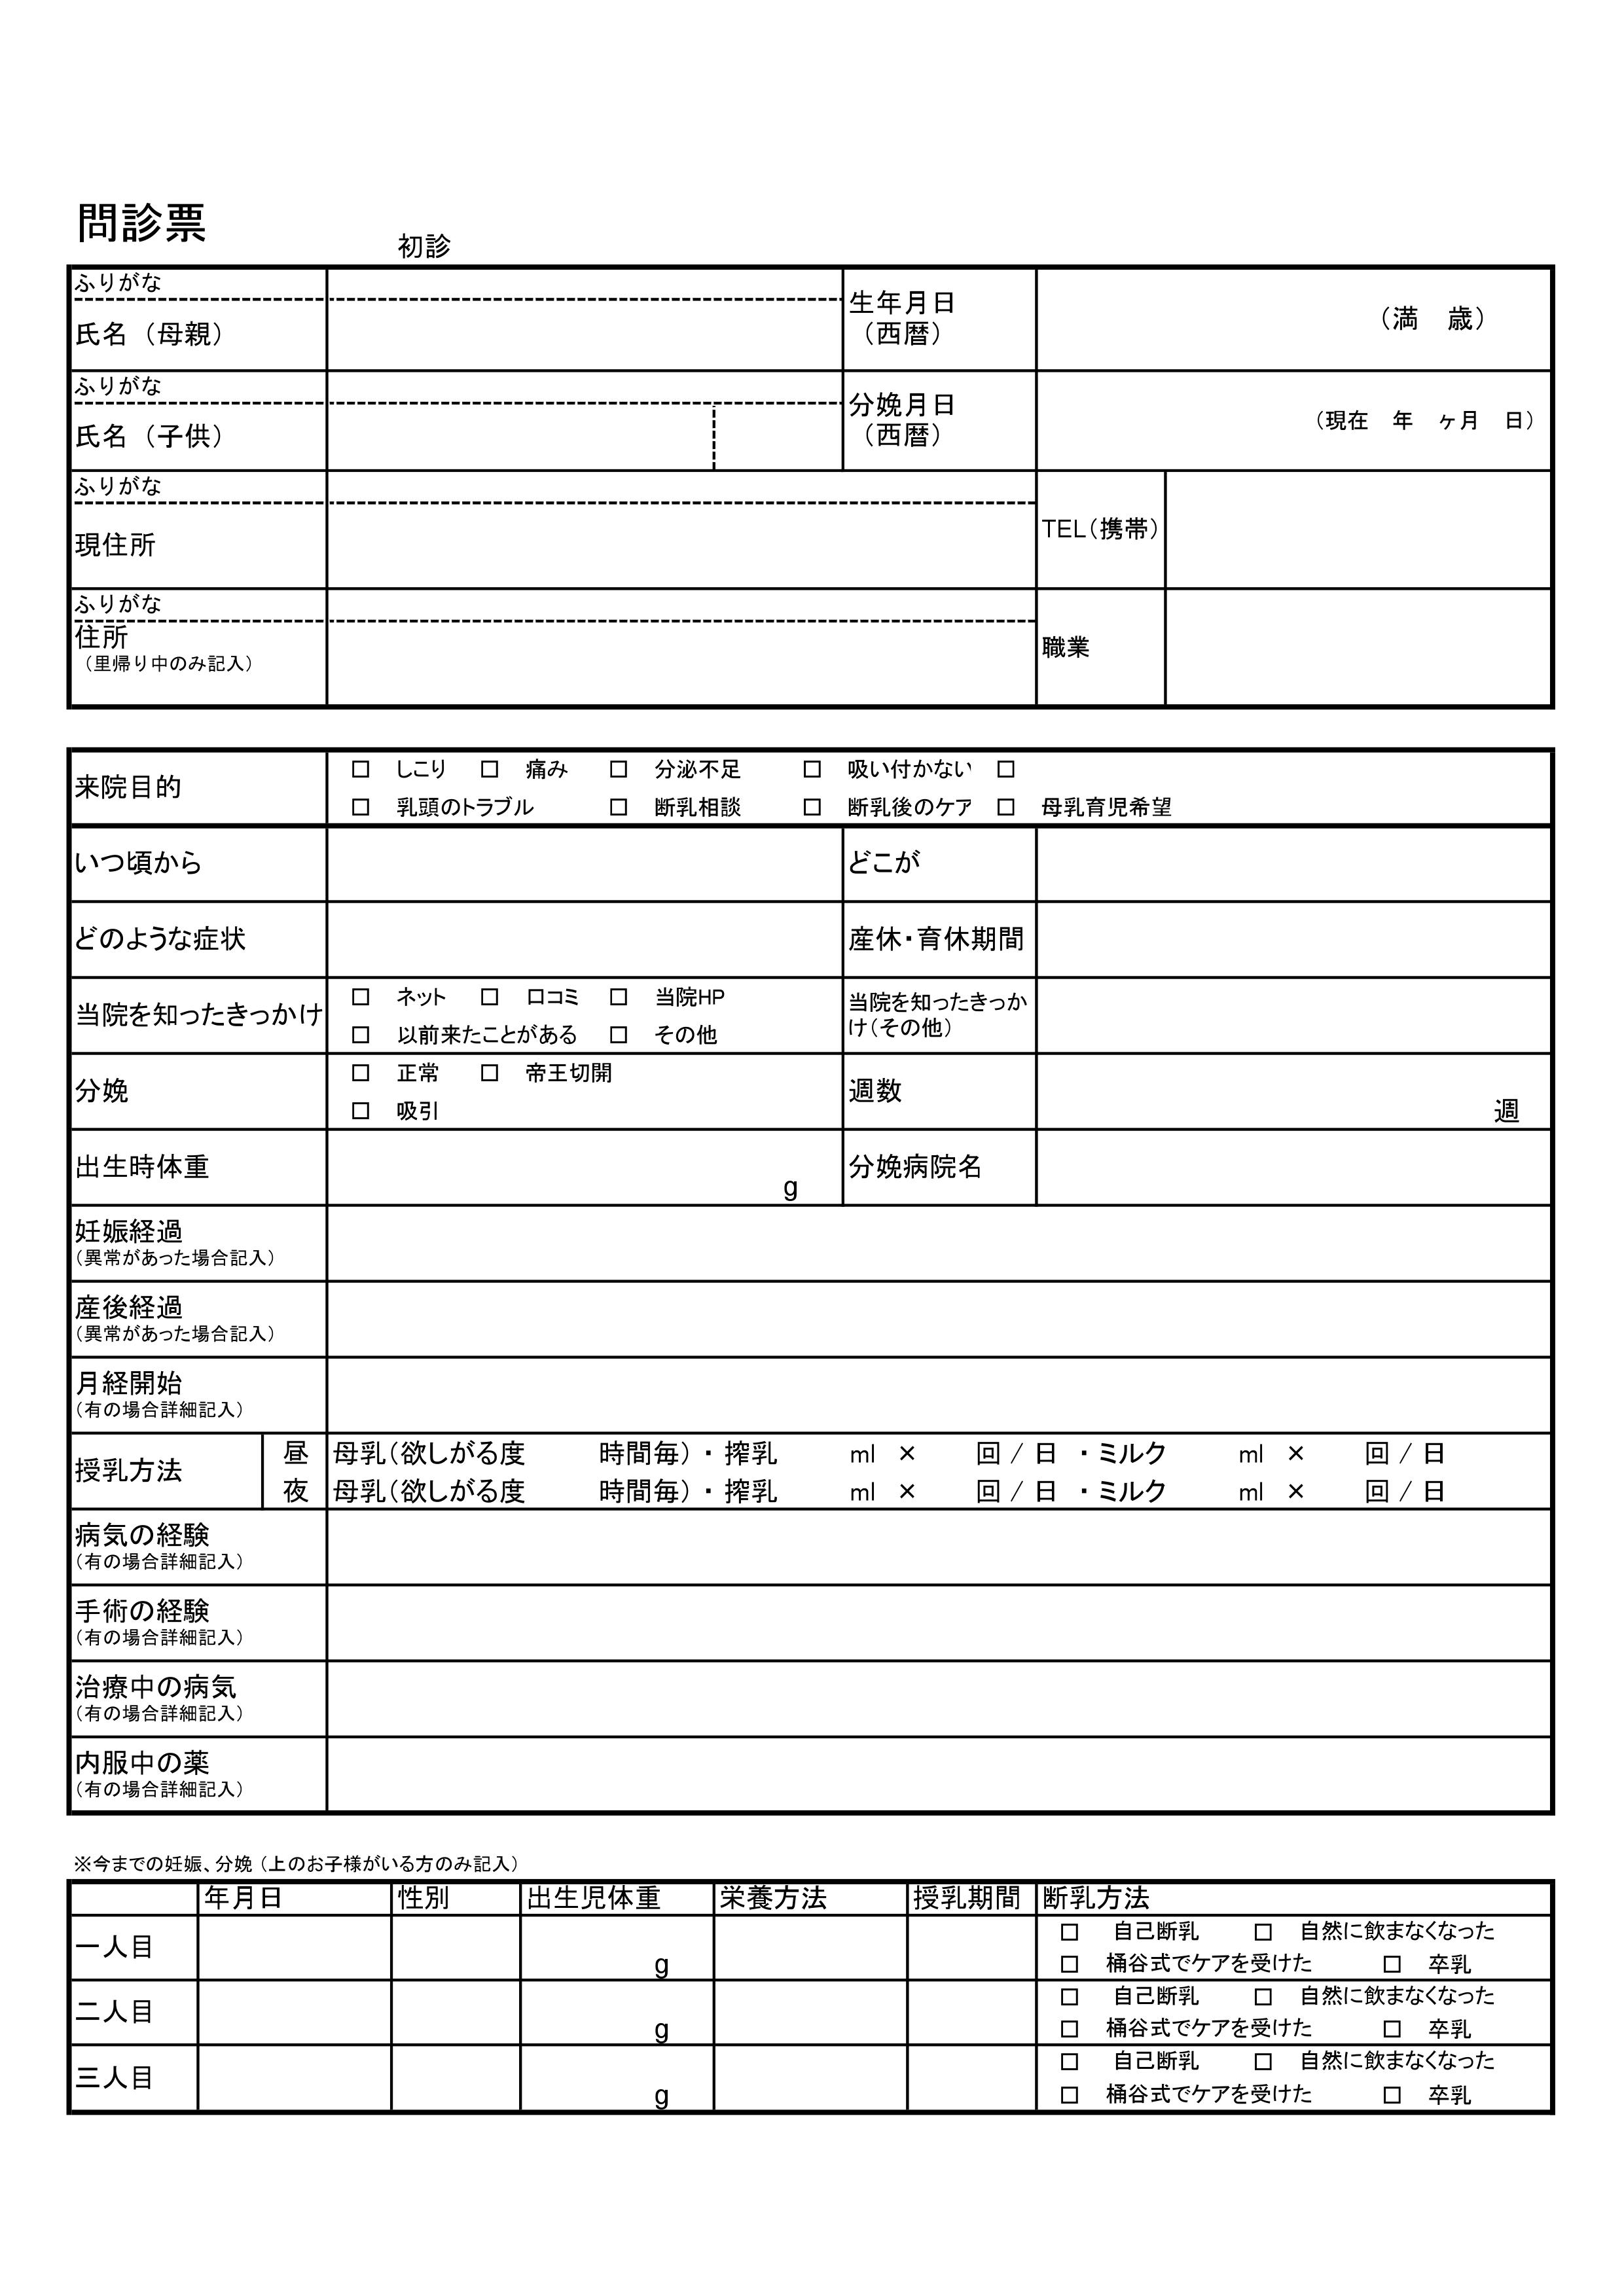 github i 201 electronic medical records byexcel